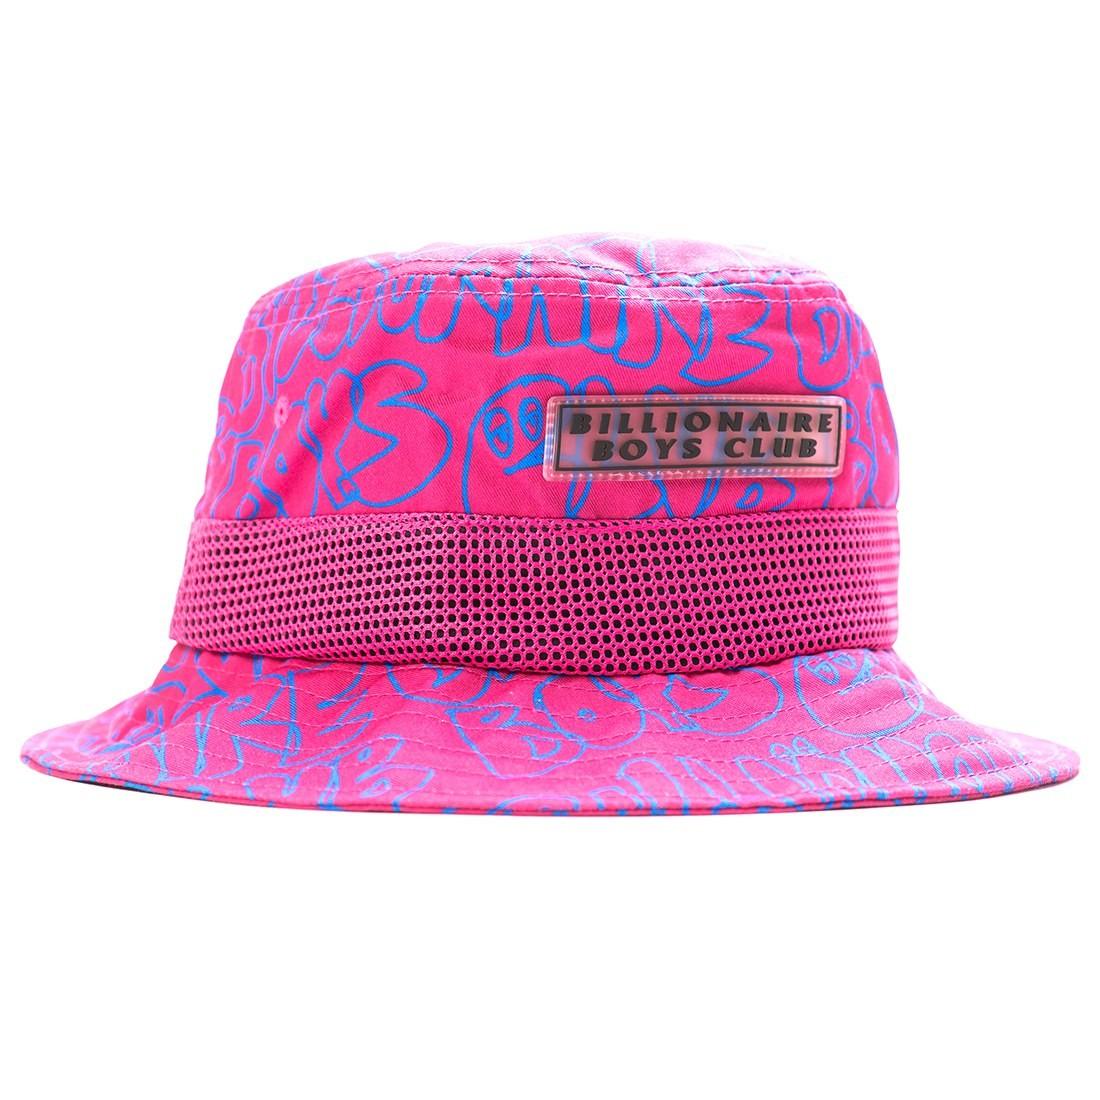 Billionaire Boys Club Get Buckets Bucket Hat (pink / carmine)